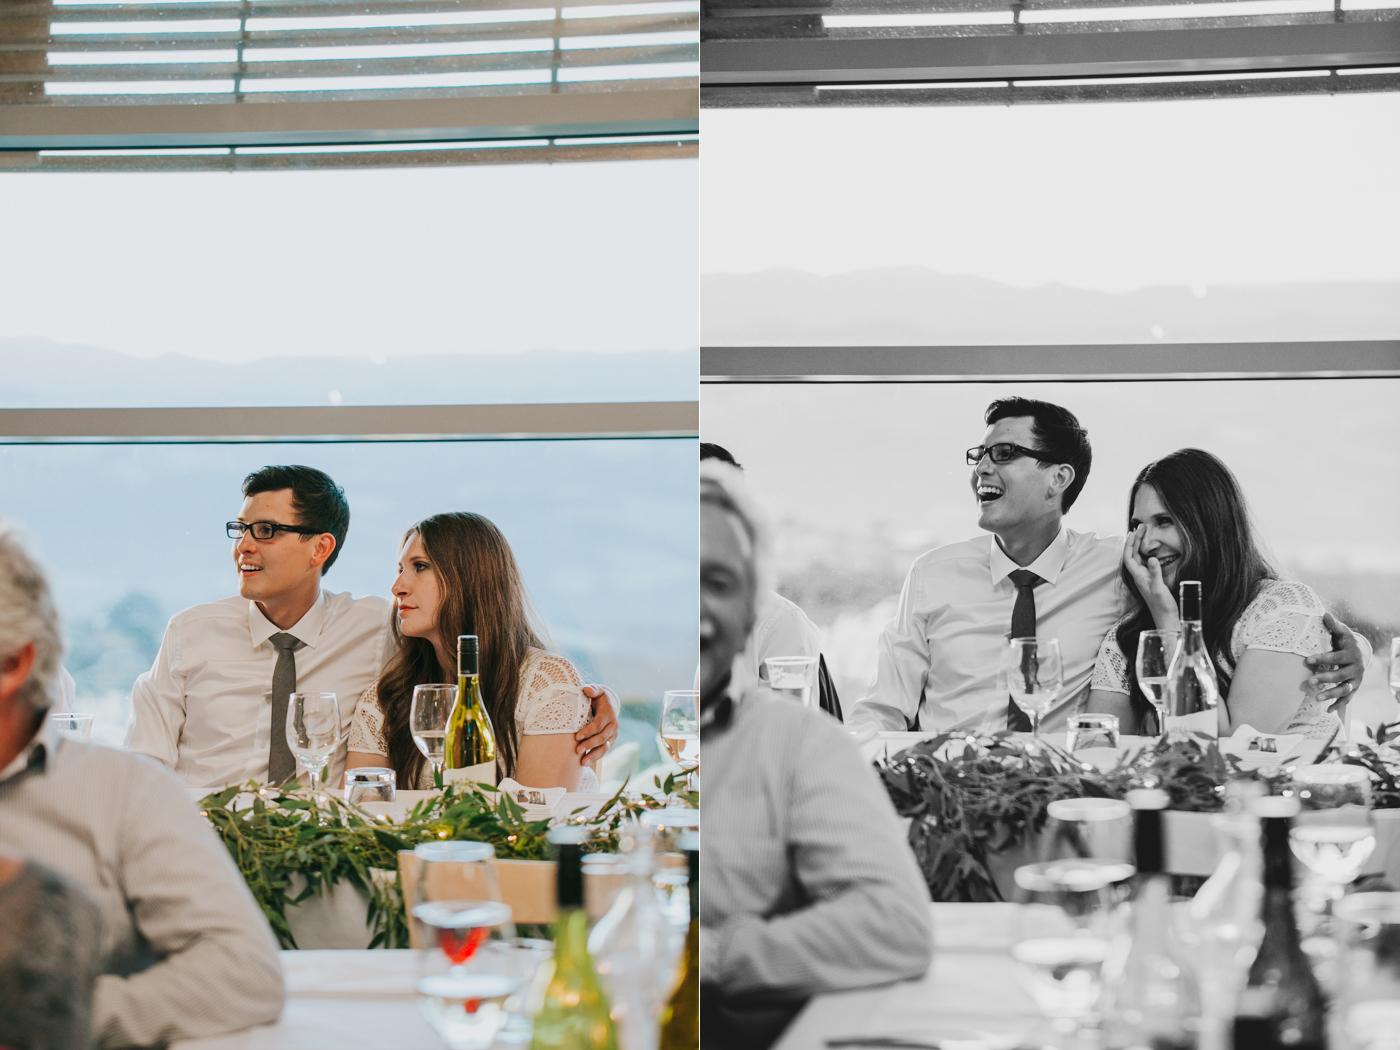 Ariana & Tim - Dunedin, New Zealand Wedding - Destination Wedding - Samantha Heather Photography-240.jpg